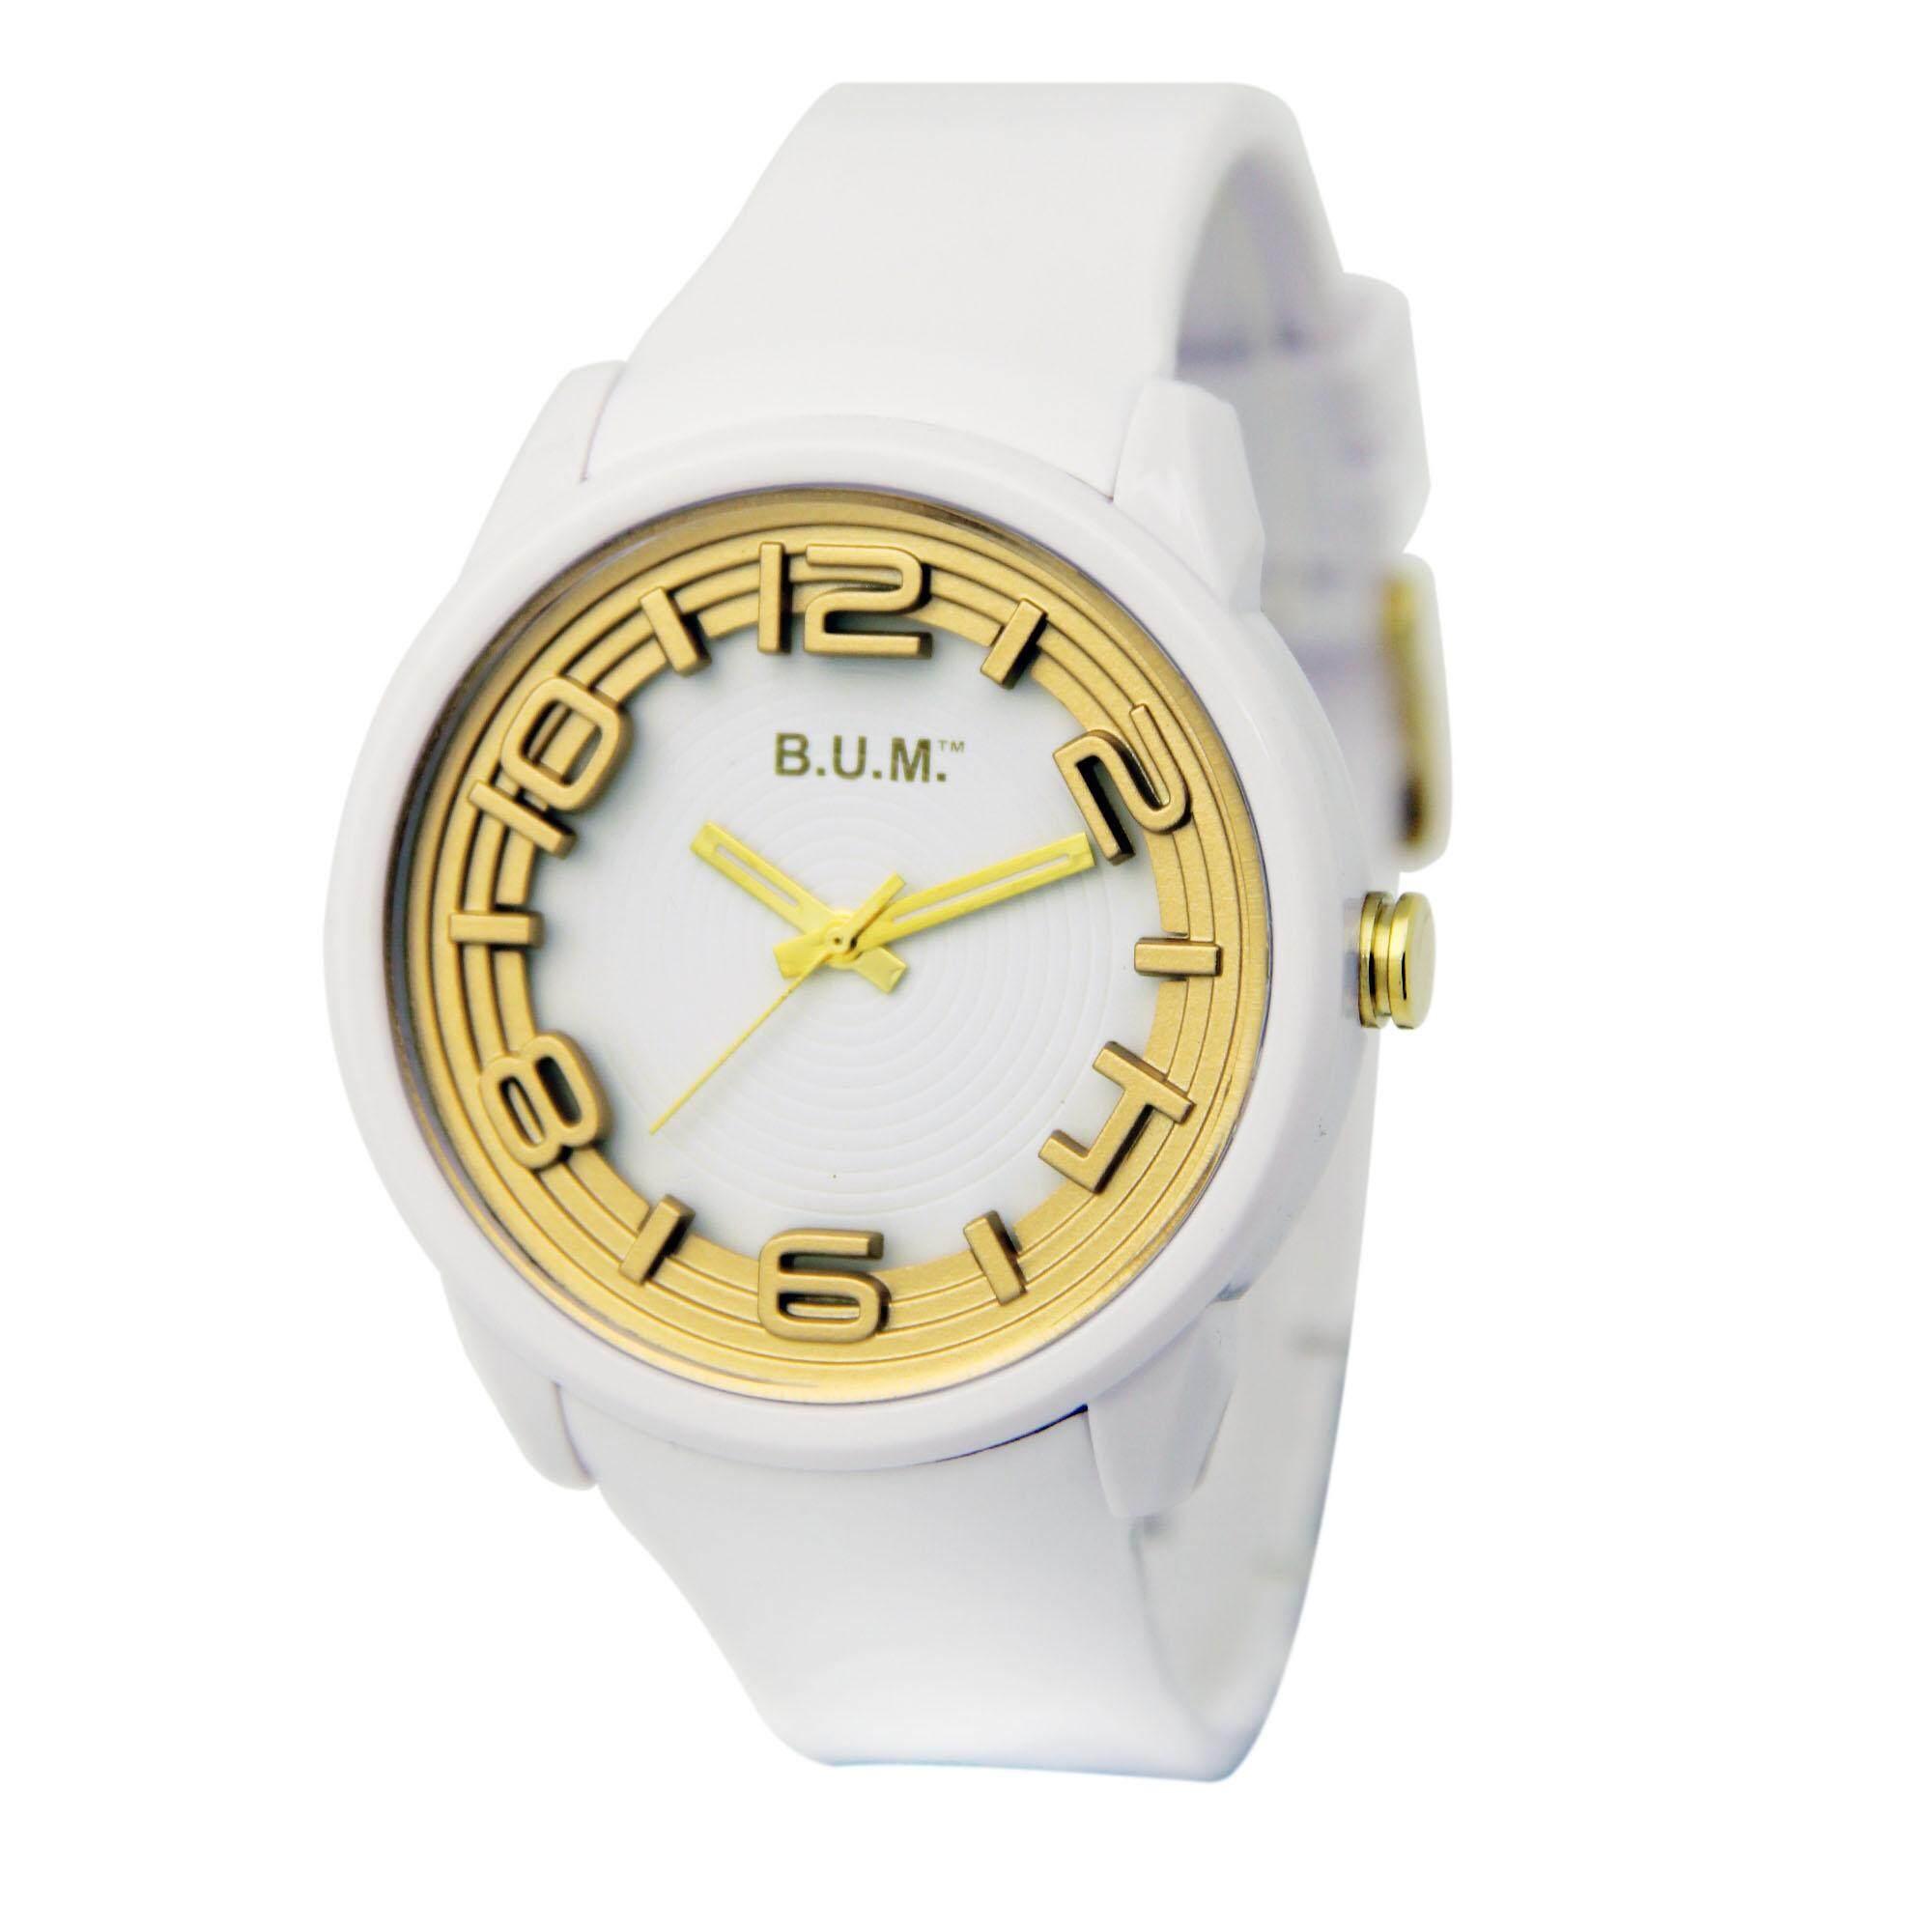 B.U.M Equipment  fashionable contracted leisure fashion unisex watch waterproof 46mm case model B882 Malaysia